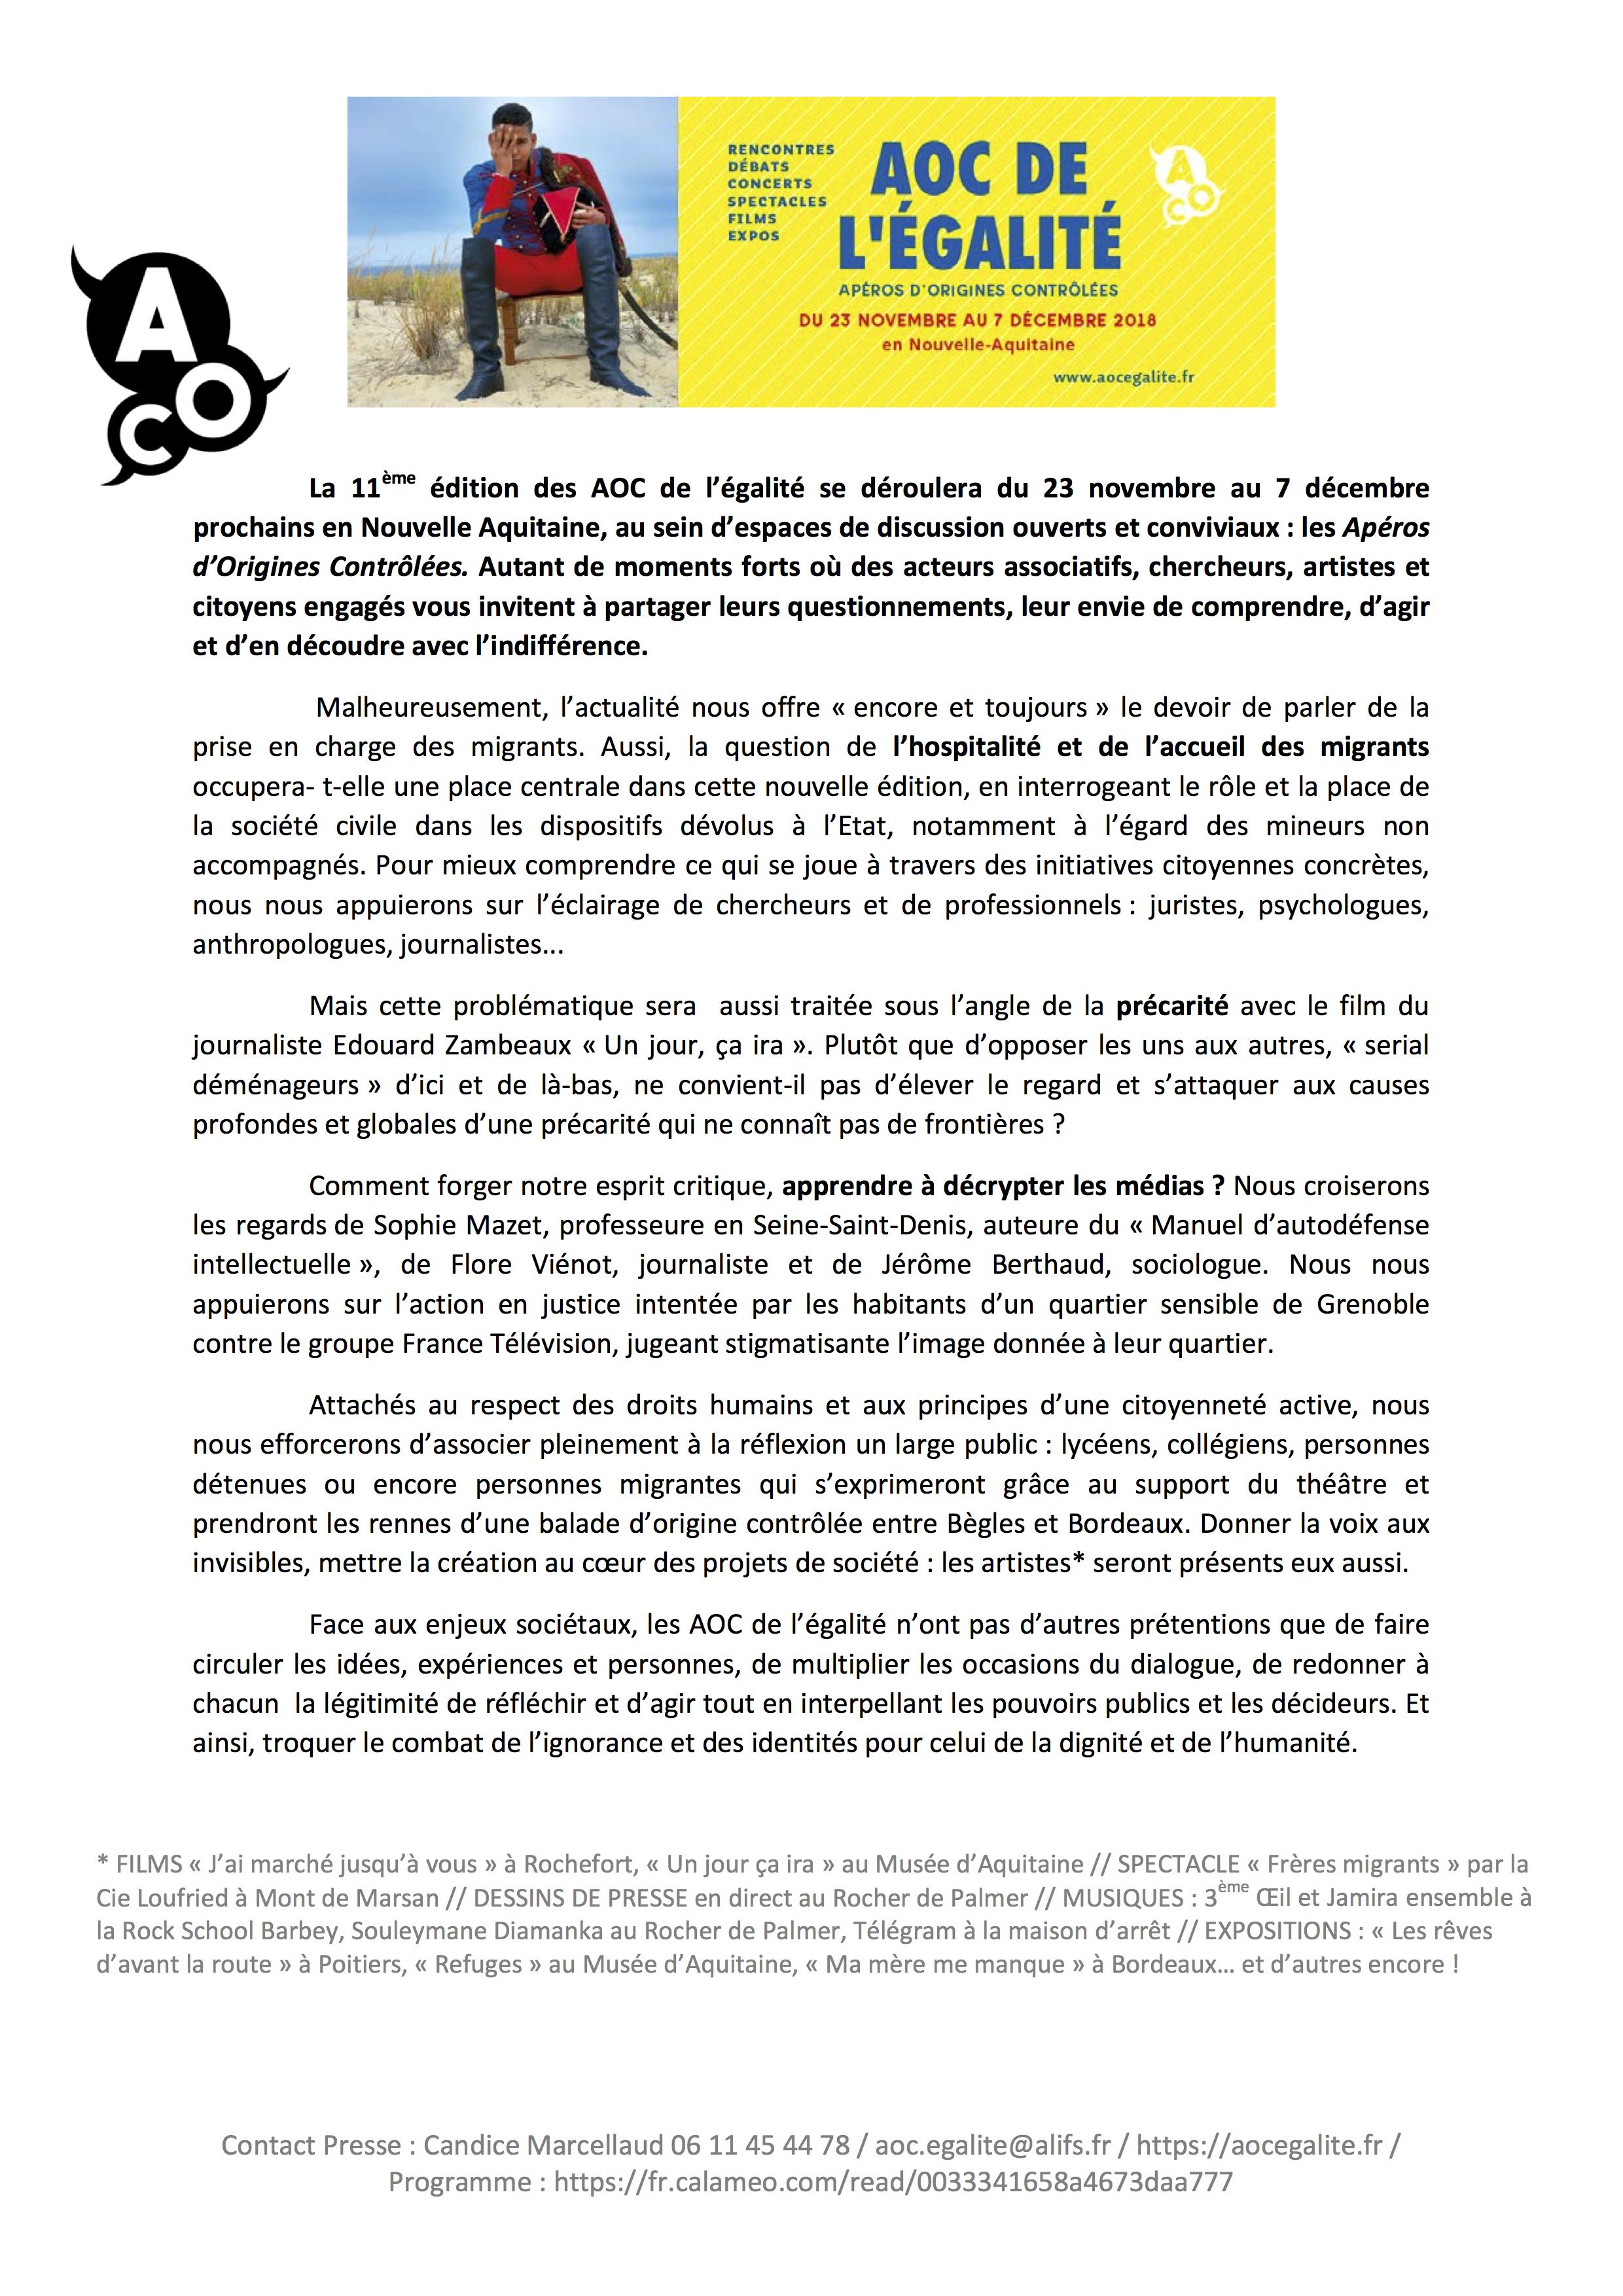 cp-aoc-de-legalite-2018